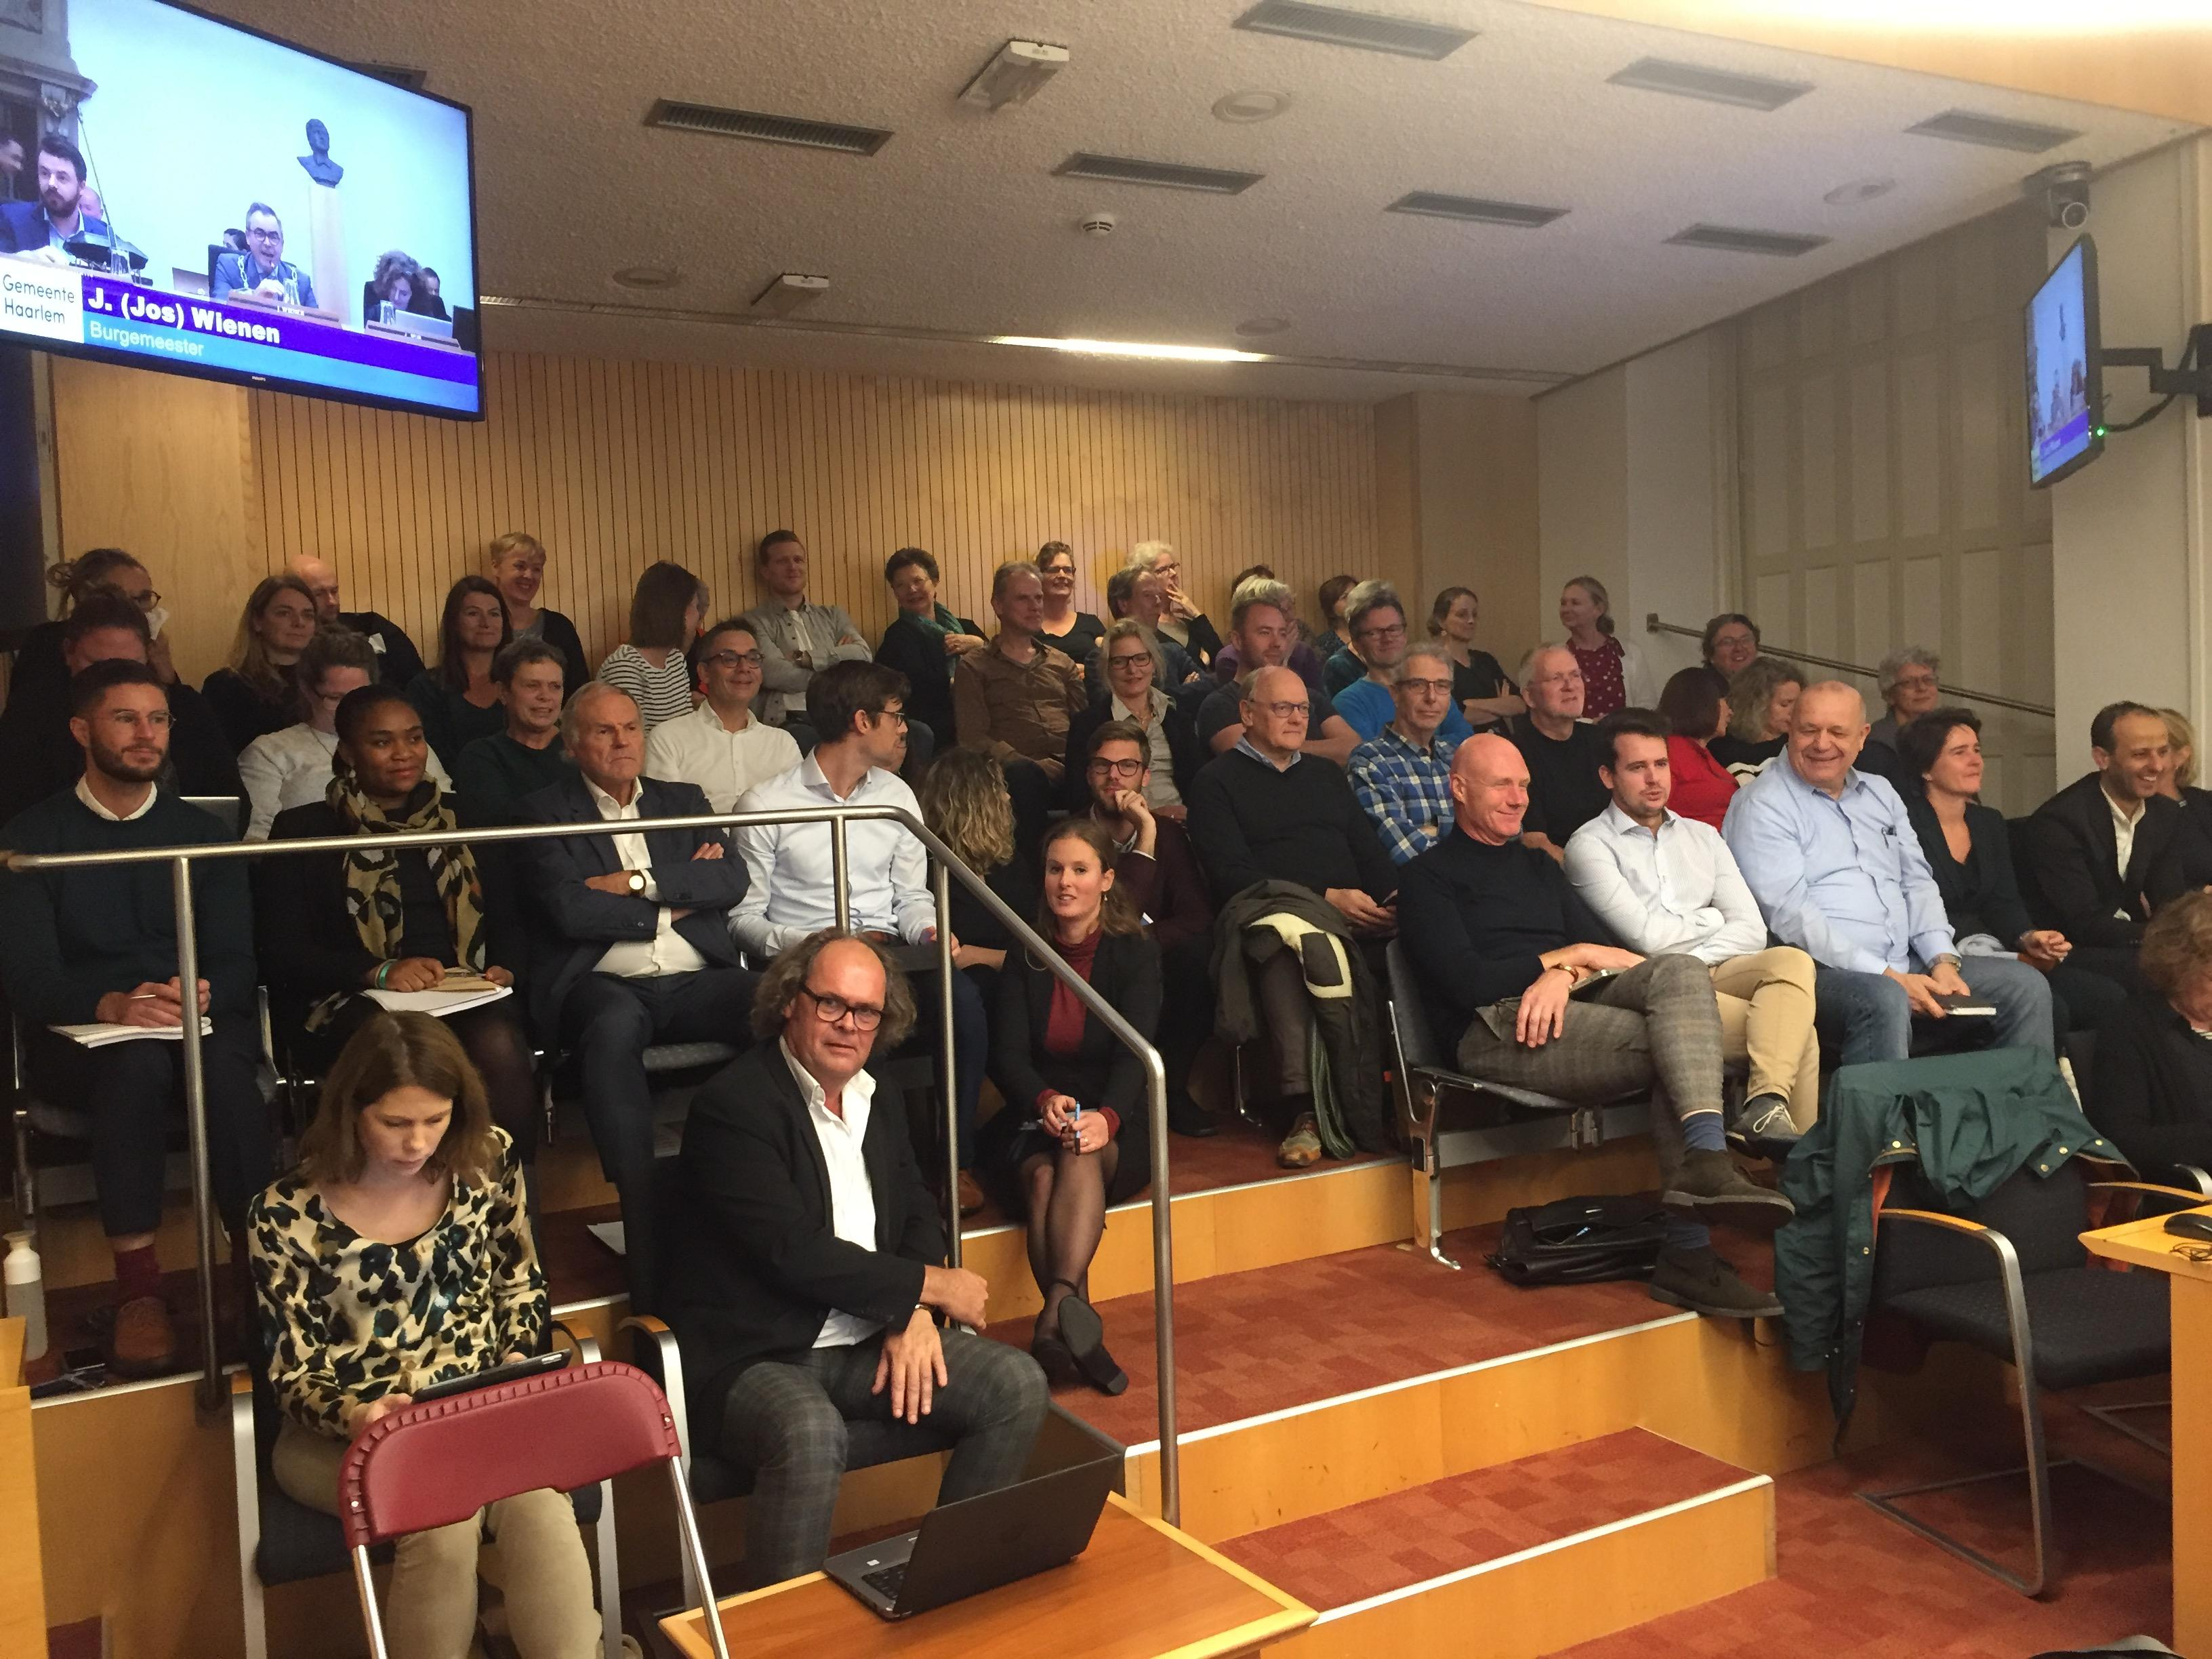 CDA/PvdA: rem op toerisme naar Haarlem